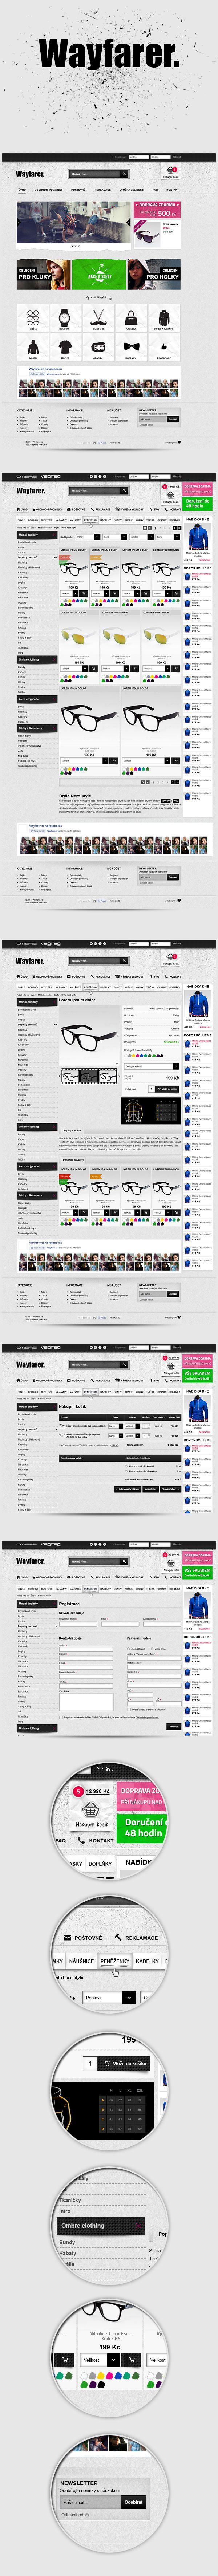 Wayfarer by Visualcreative.cz , via Behance